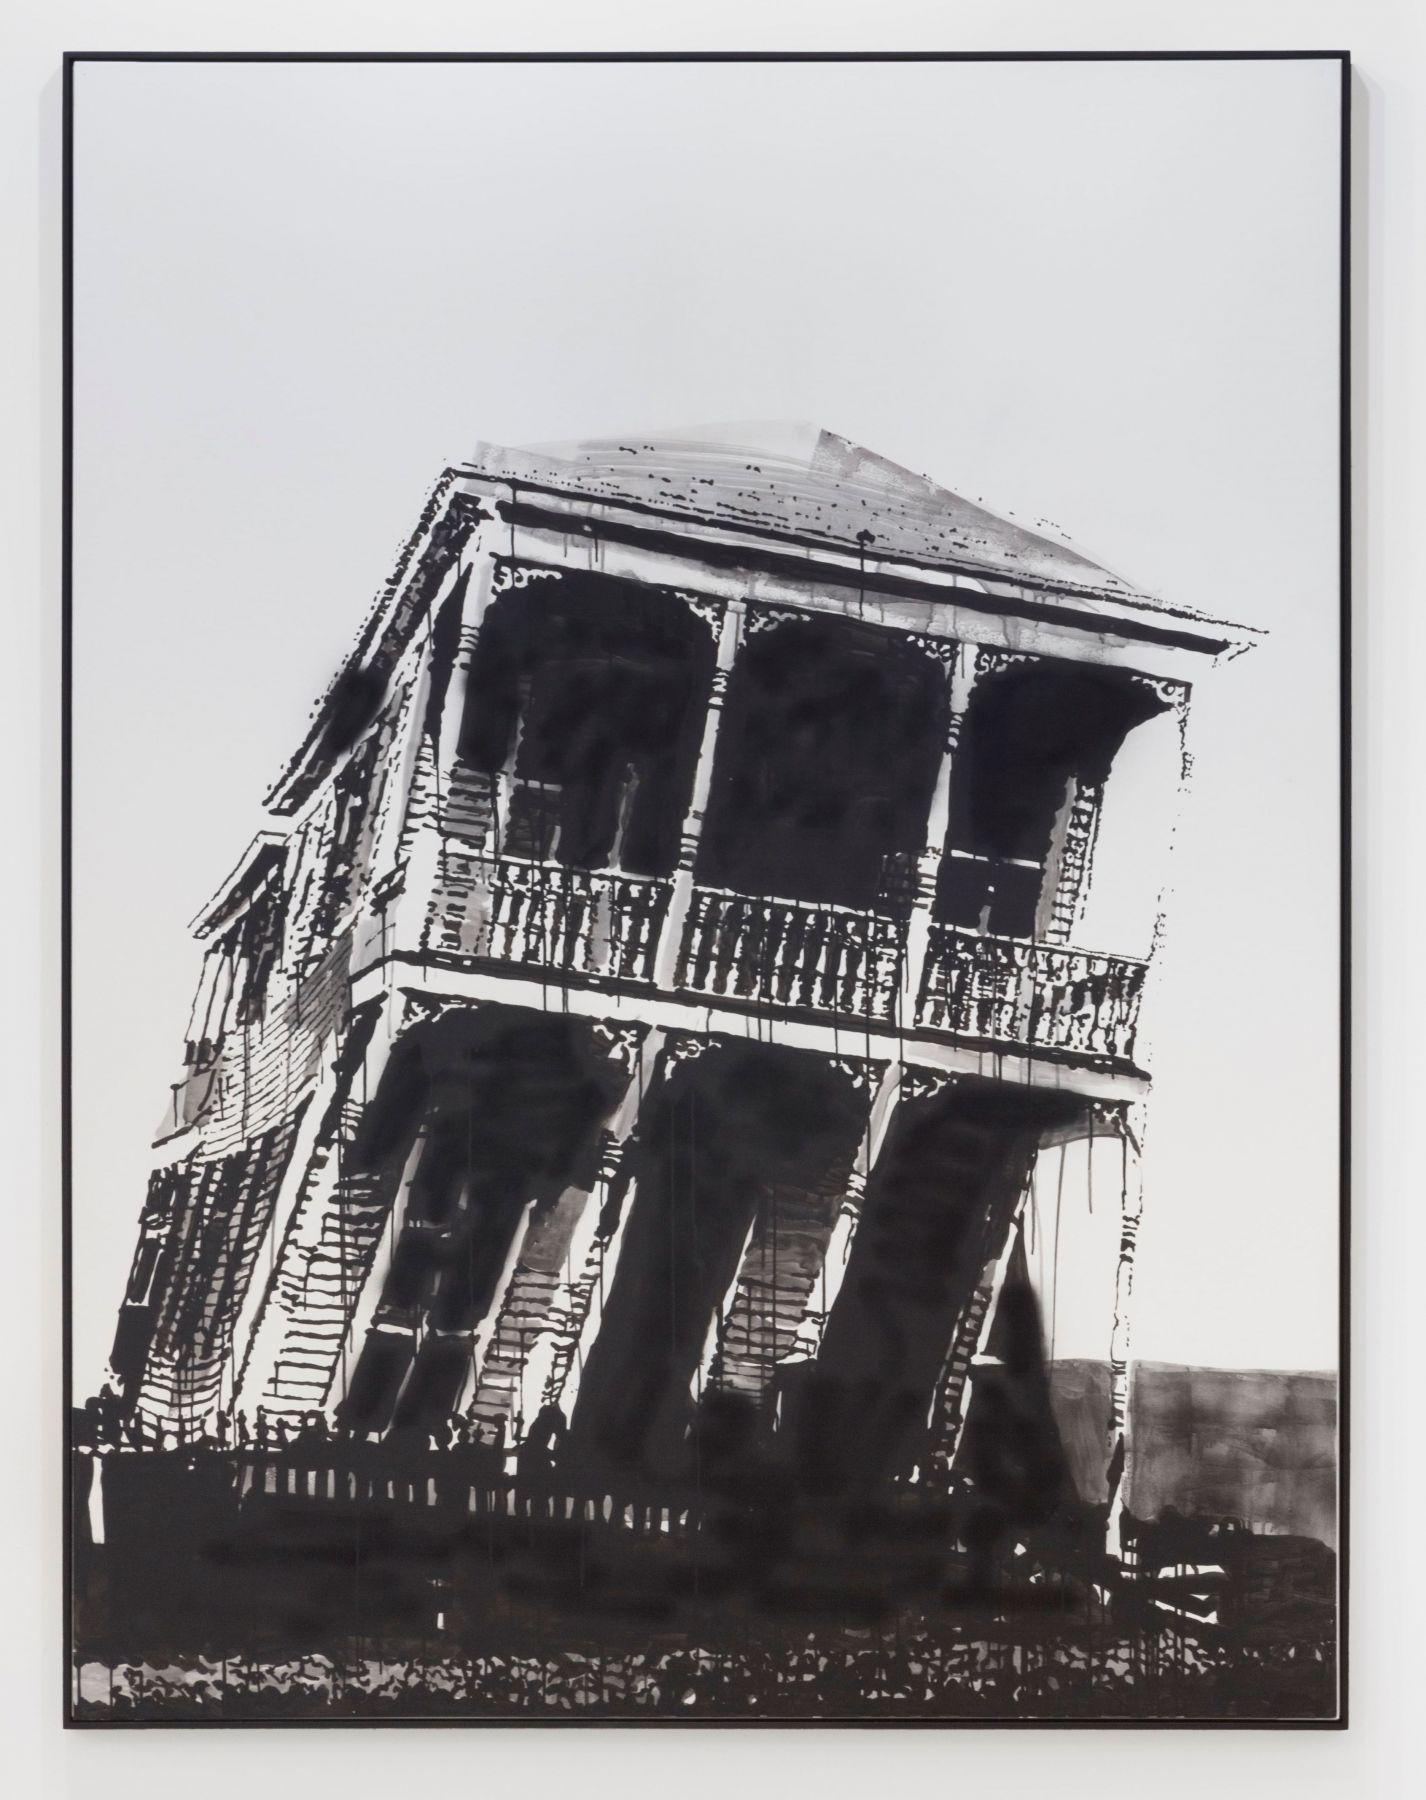 MONICA BONVICINI Galveston Hurricane, 1900